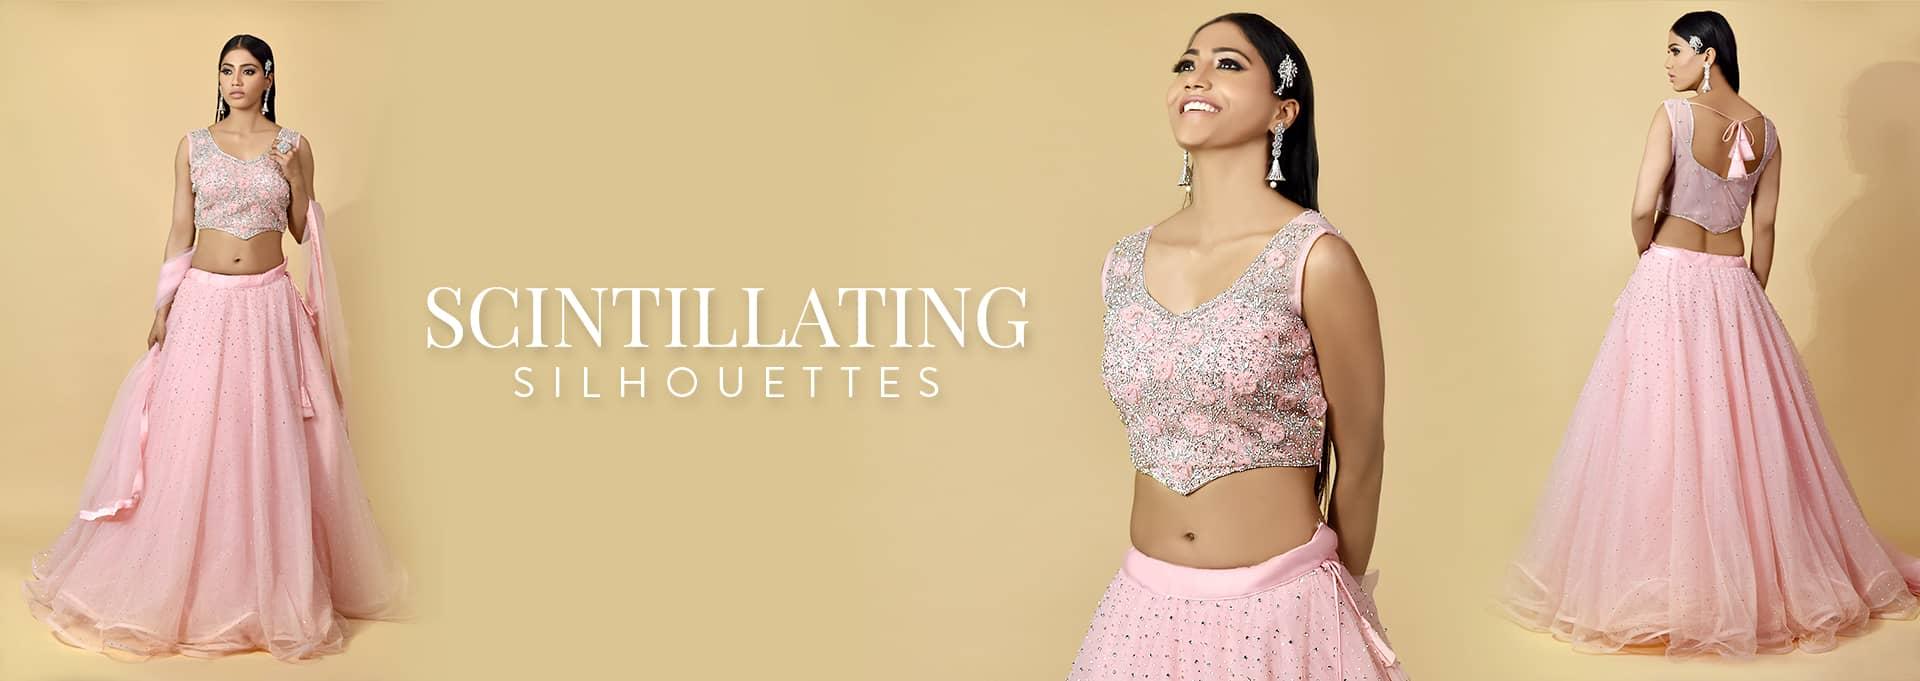 Surya Sarees | SCINTILLATING SILHOUSETTES | House of Surya | Chandni Chowk